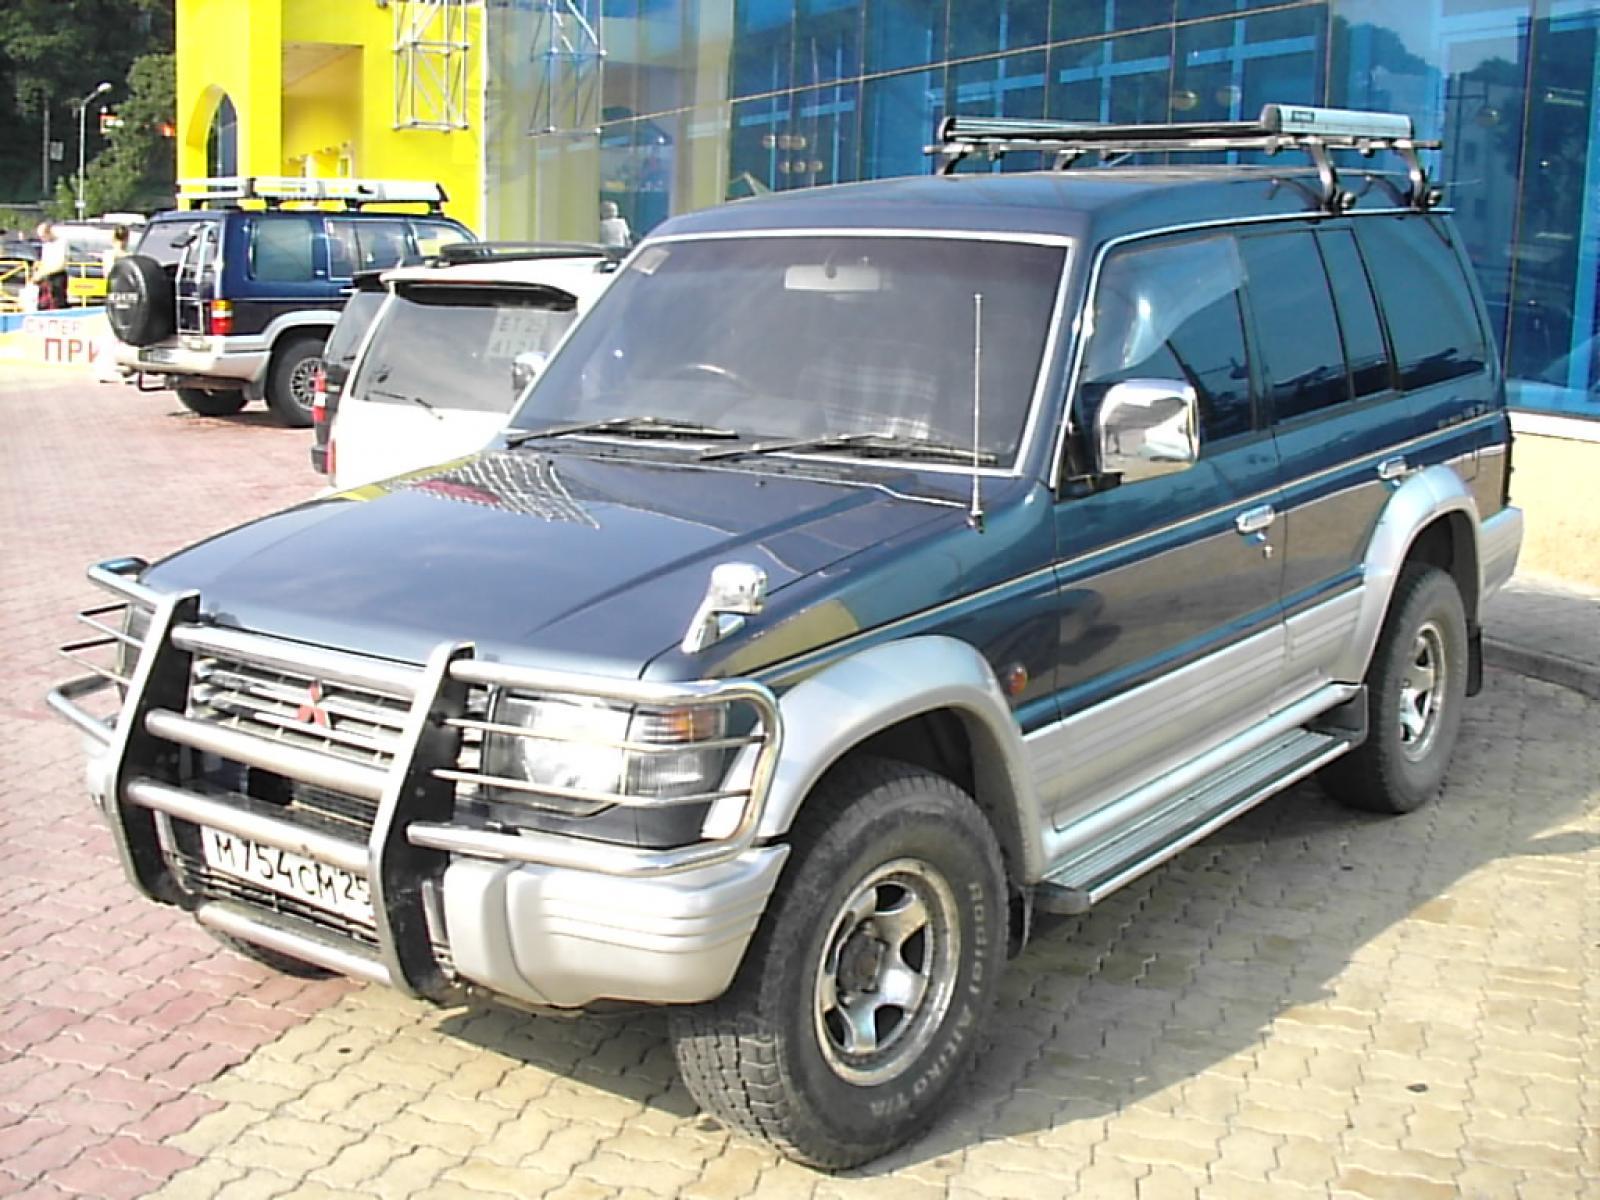 1994 Mitsubishi Montero Information And Photos Zombiedrive Pajero Junior Wiring Diagram 1 800 1024 1280 1600 Origin